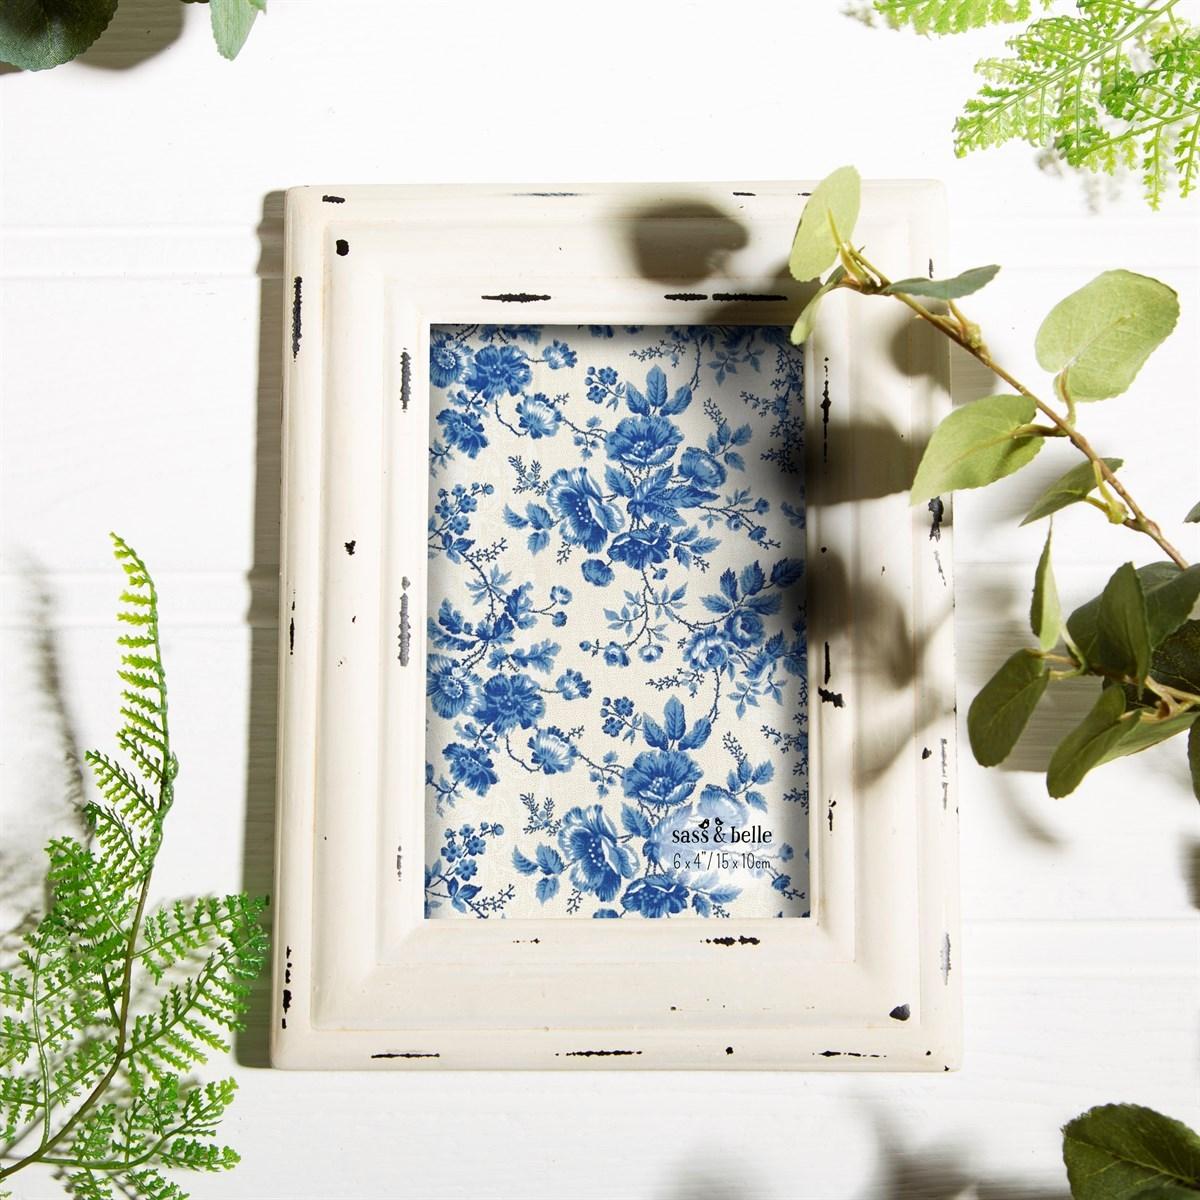 "Sass /& Belle Ashley Farmhouse Wood Standing Photo Frame 4/""x 6/"" Shabby Chic"